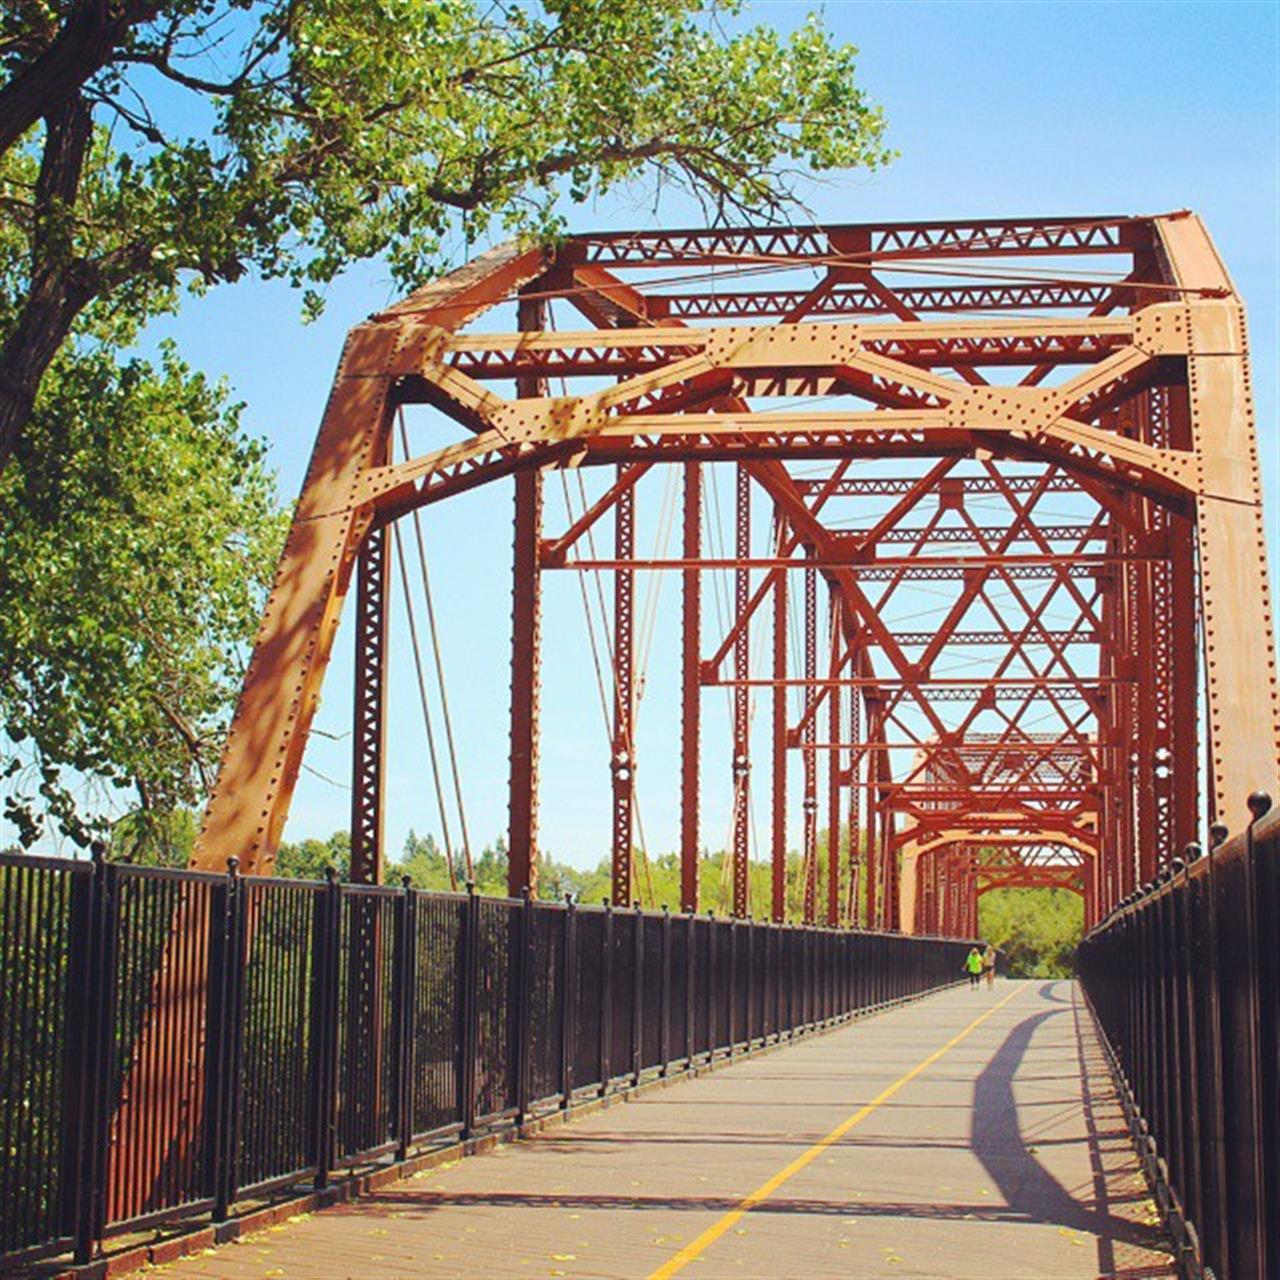 Beautiful Fair Oaks Bridge crossing over the American River. #leadingrelocal #lyonrealestate #fairoaks #americanriver #fairoaksbridge #oldfairoaks